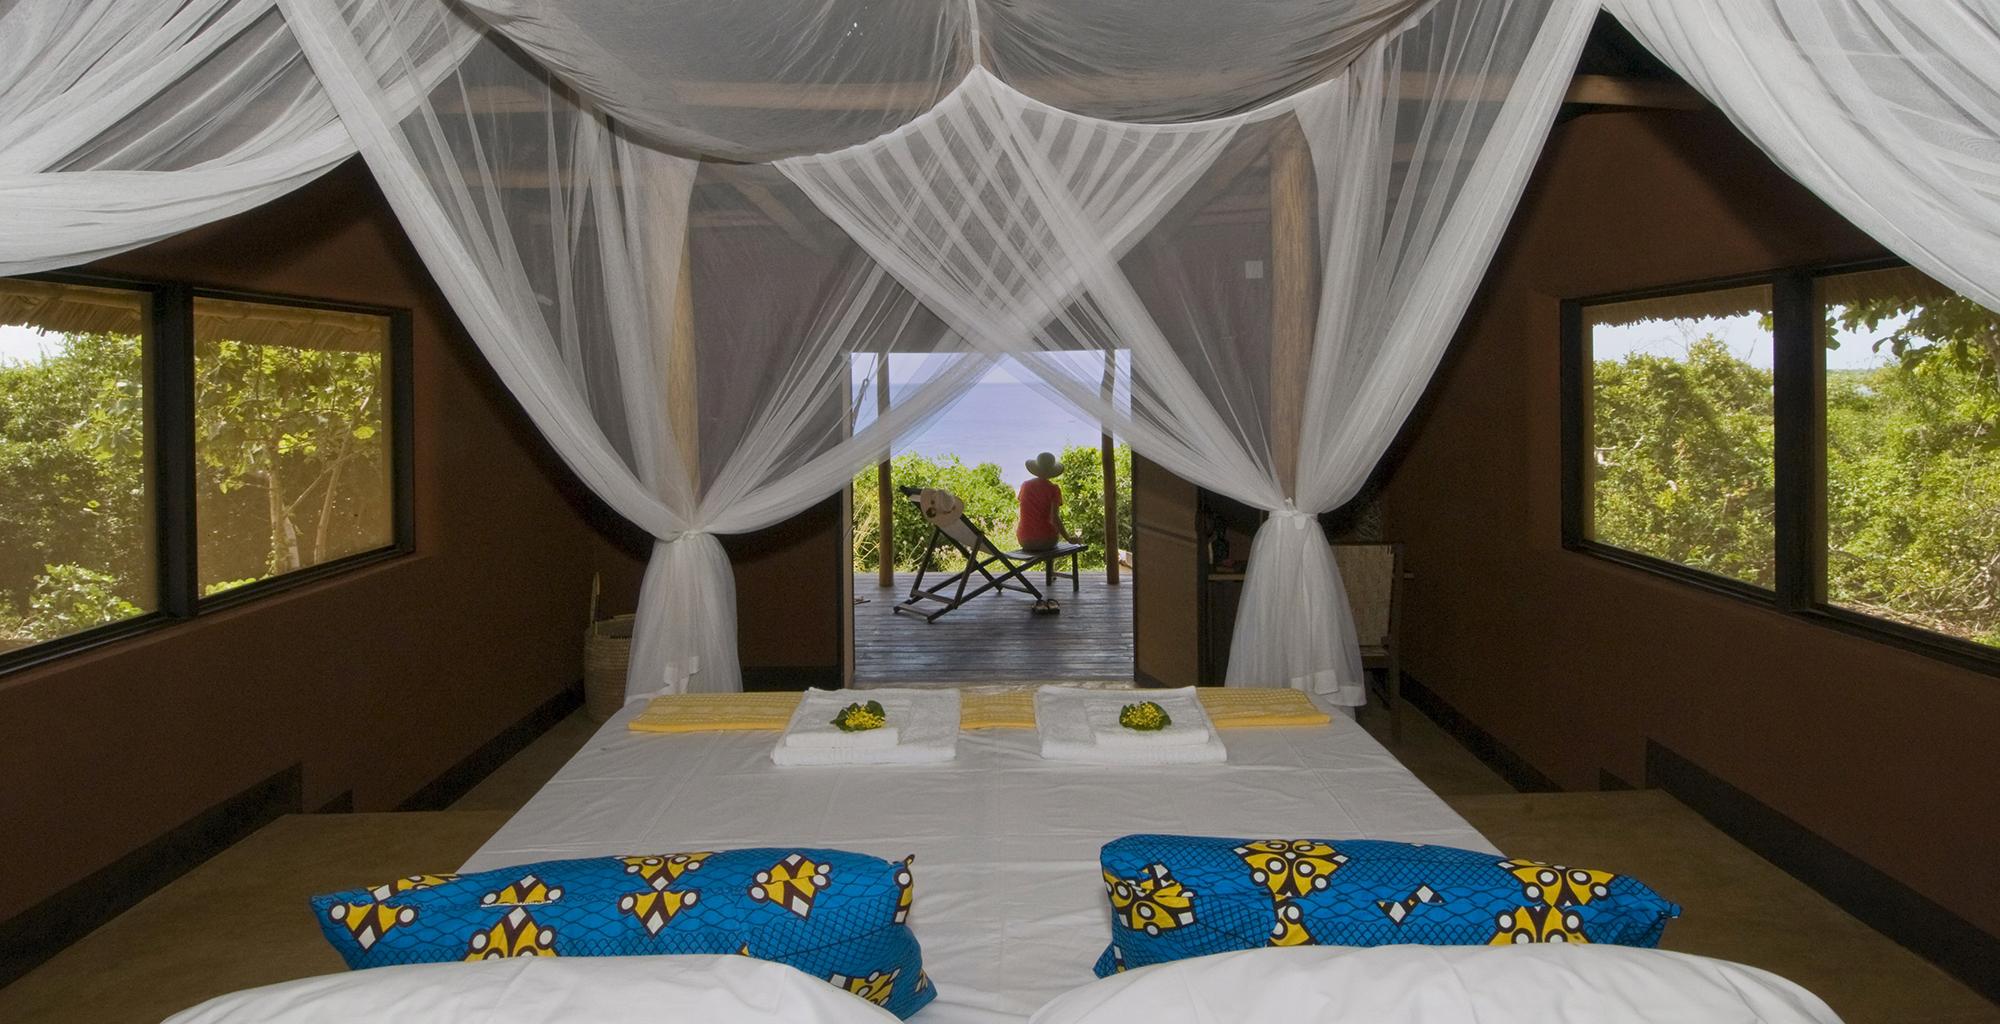 Mozambique-Nampula-Ilha-Nuarra-Lodge-Bedroom